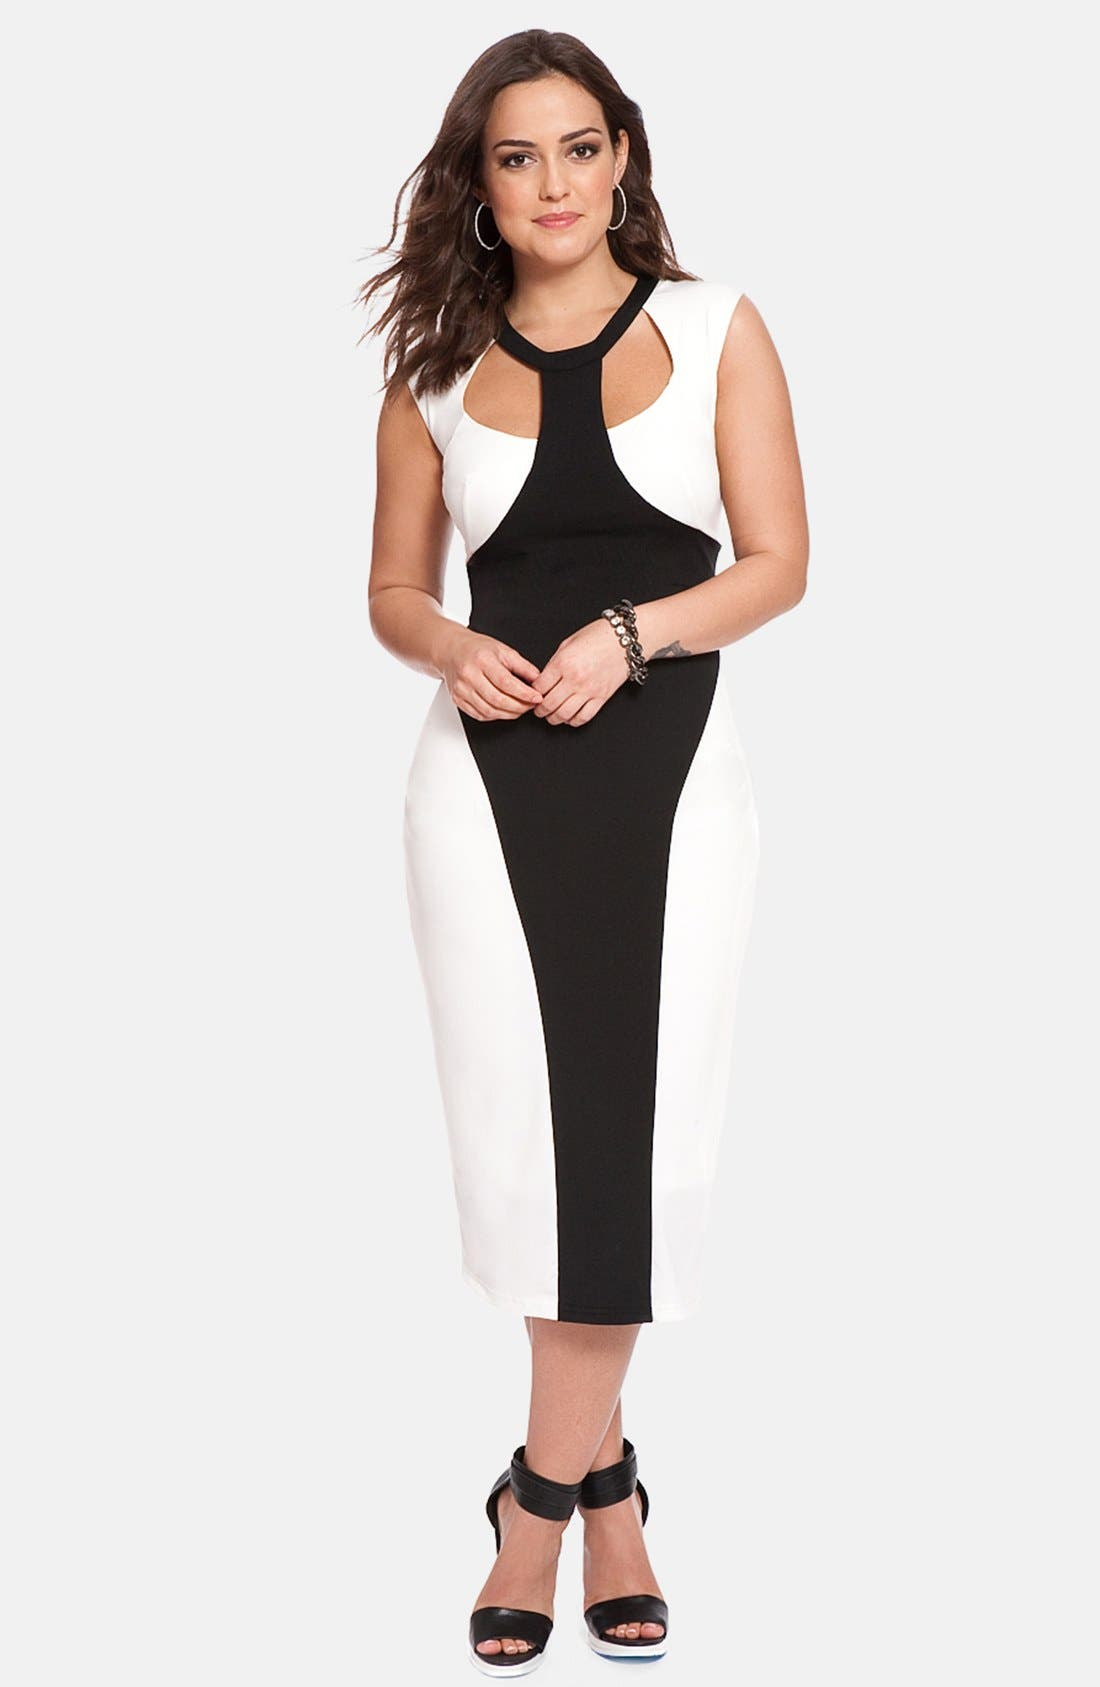 Nordstrom white dresses plus size